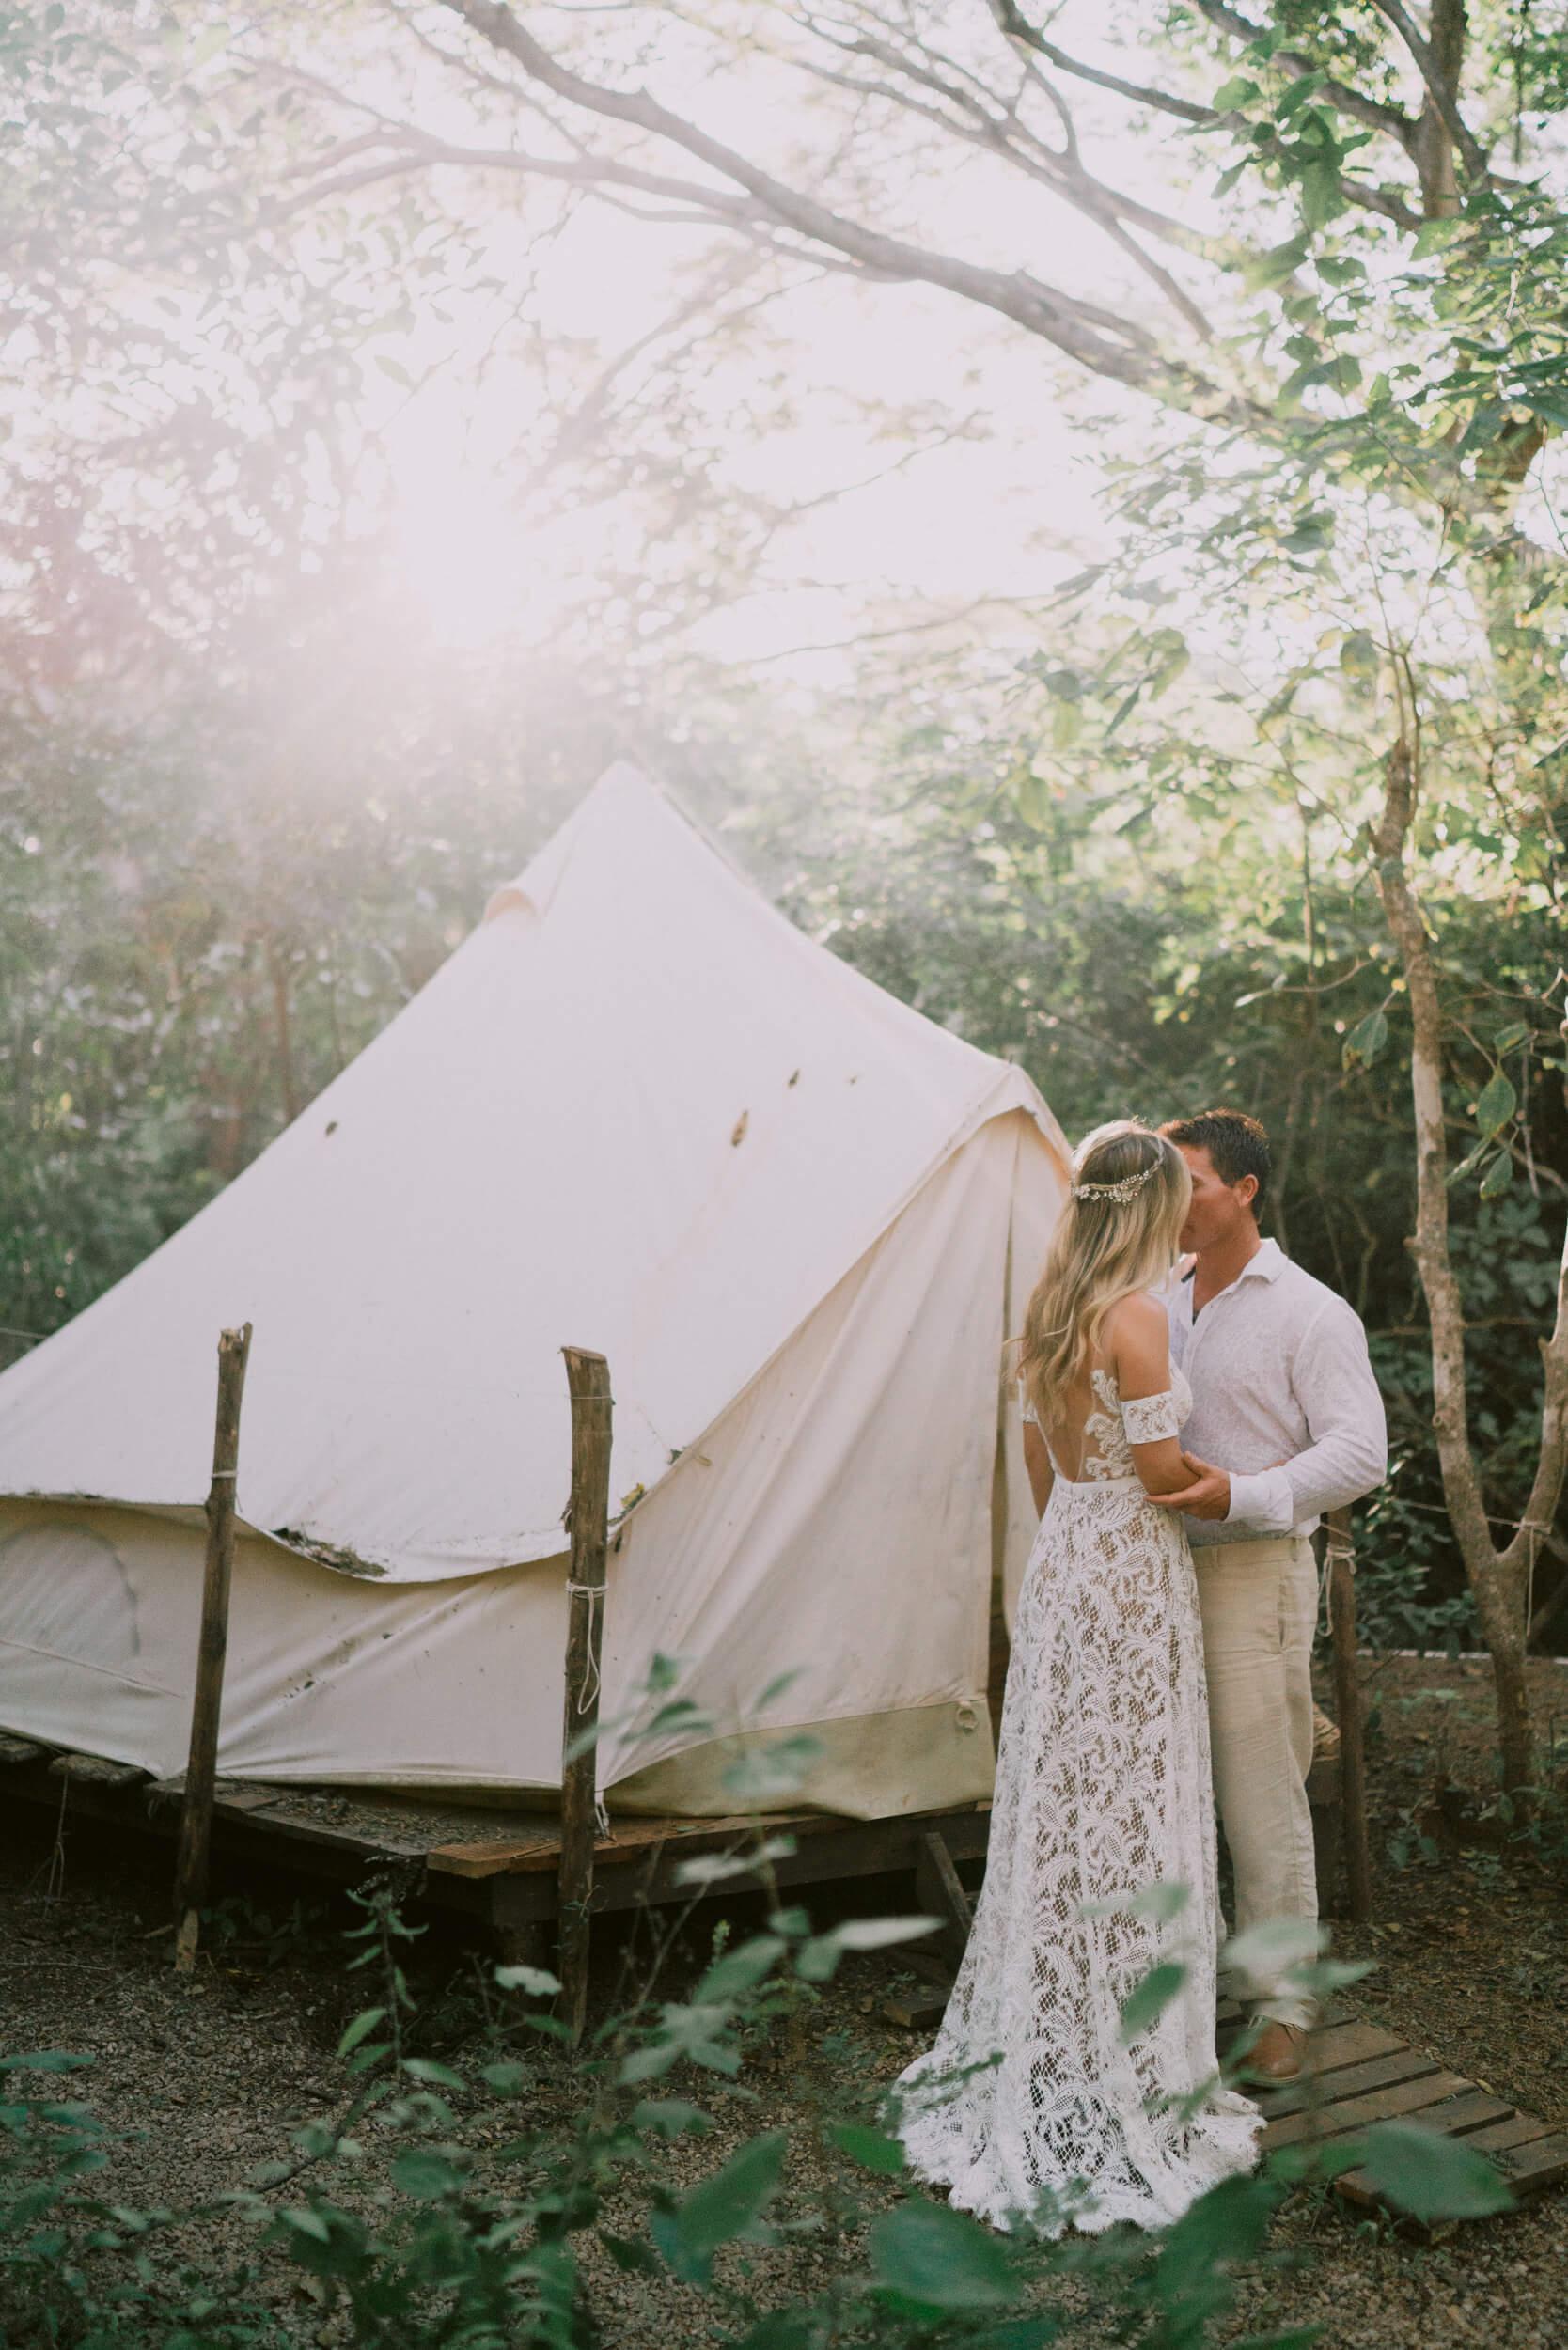 newlywed elope costa rica coast surf camp yoga beach wedding jungle